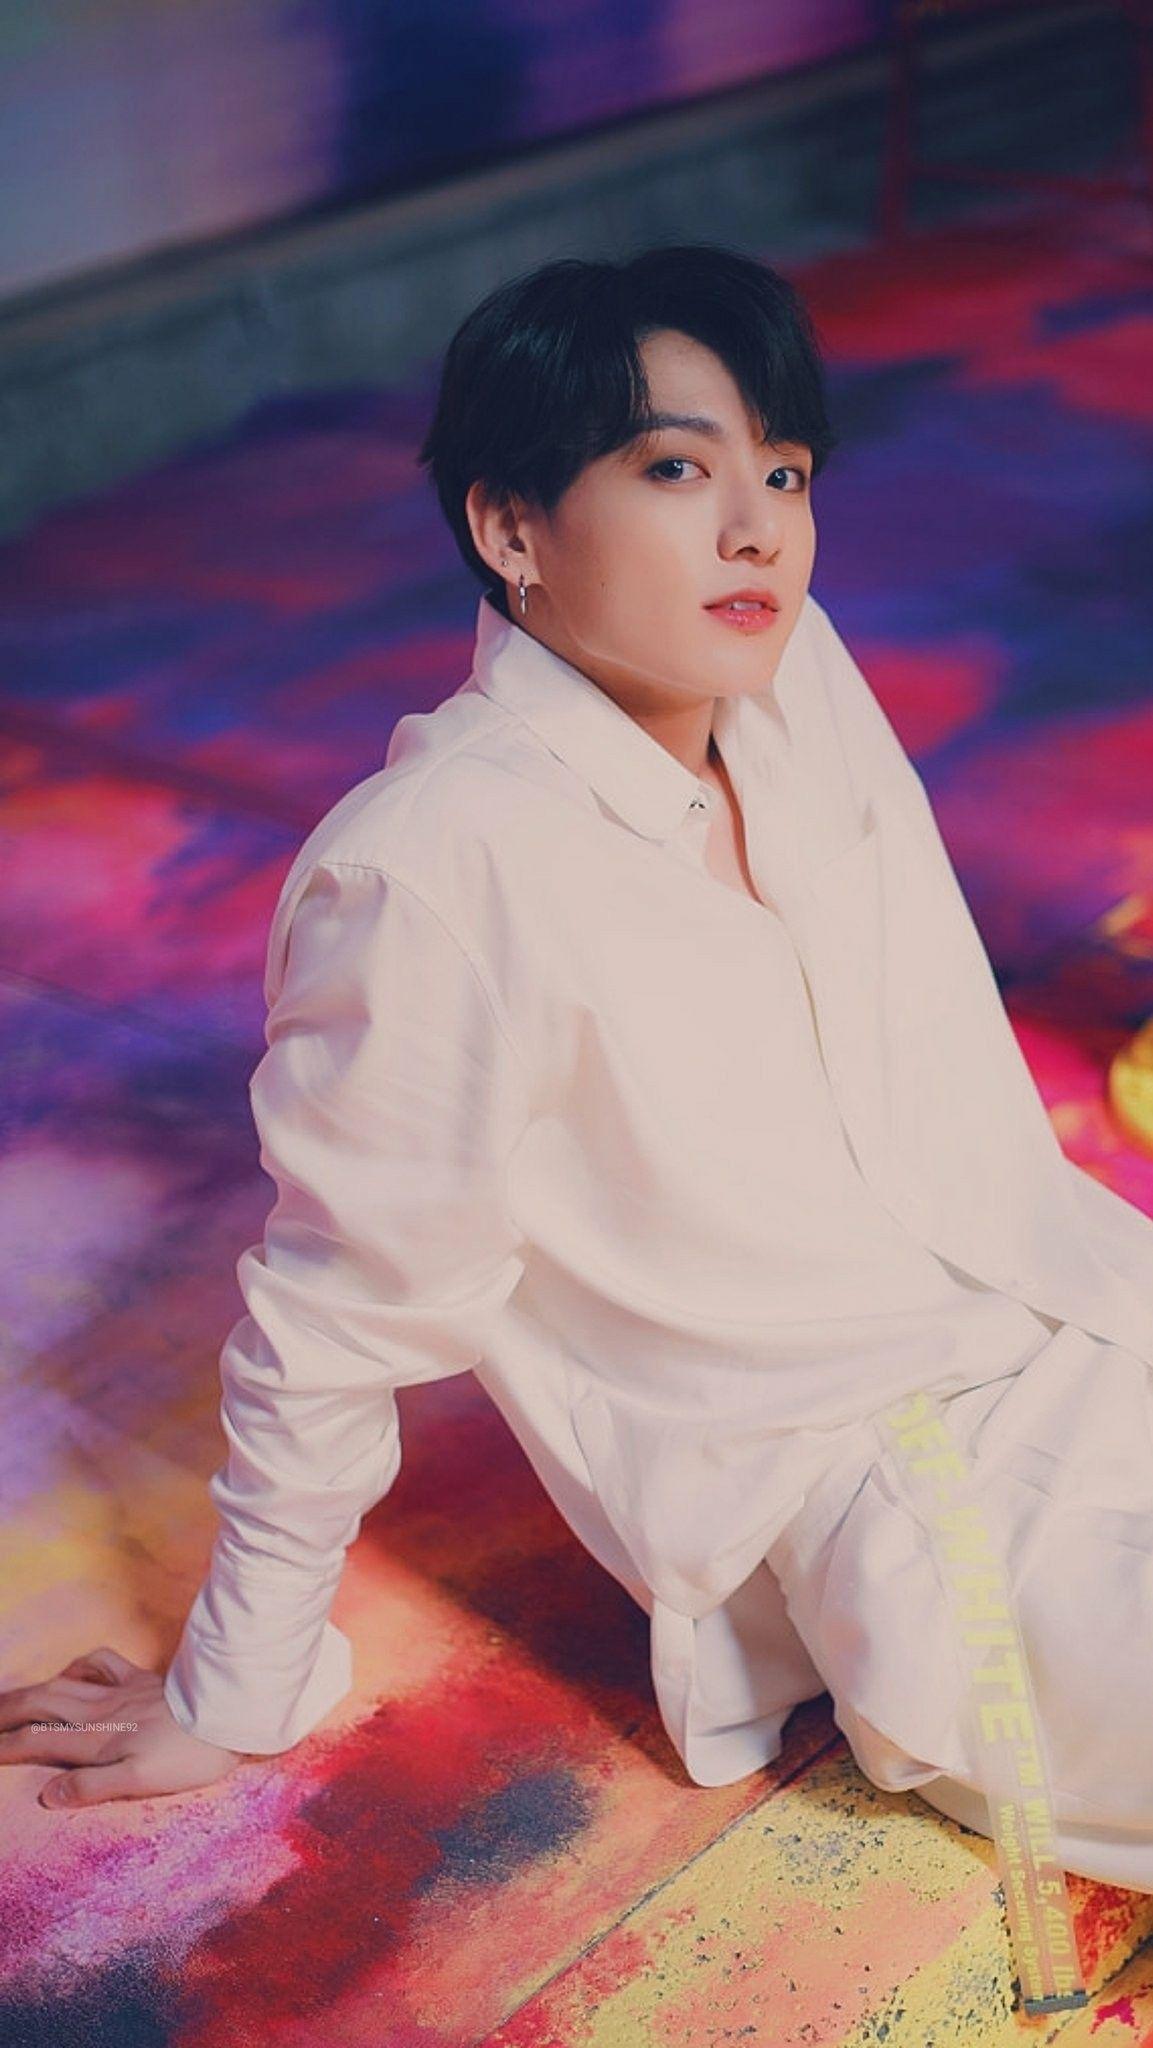 Junkook Dispatch X Naver Boy With Luv Lockscreen Wallpapers Jungkook Foto Jungkook Bts Boys Bts jungkook boy with luv wallpaper